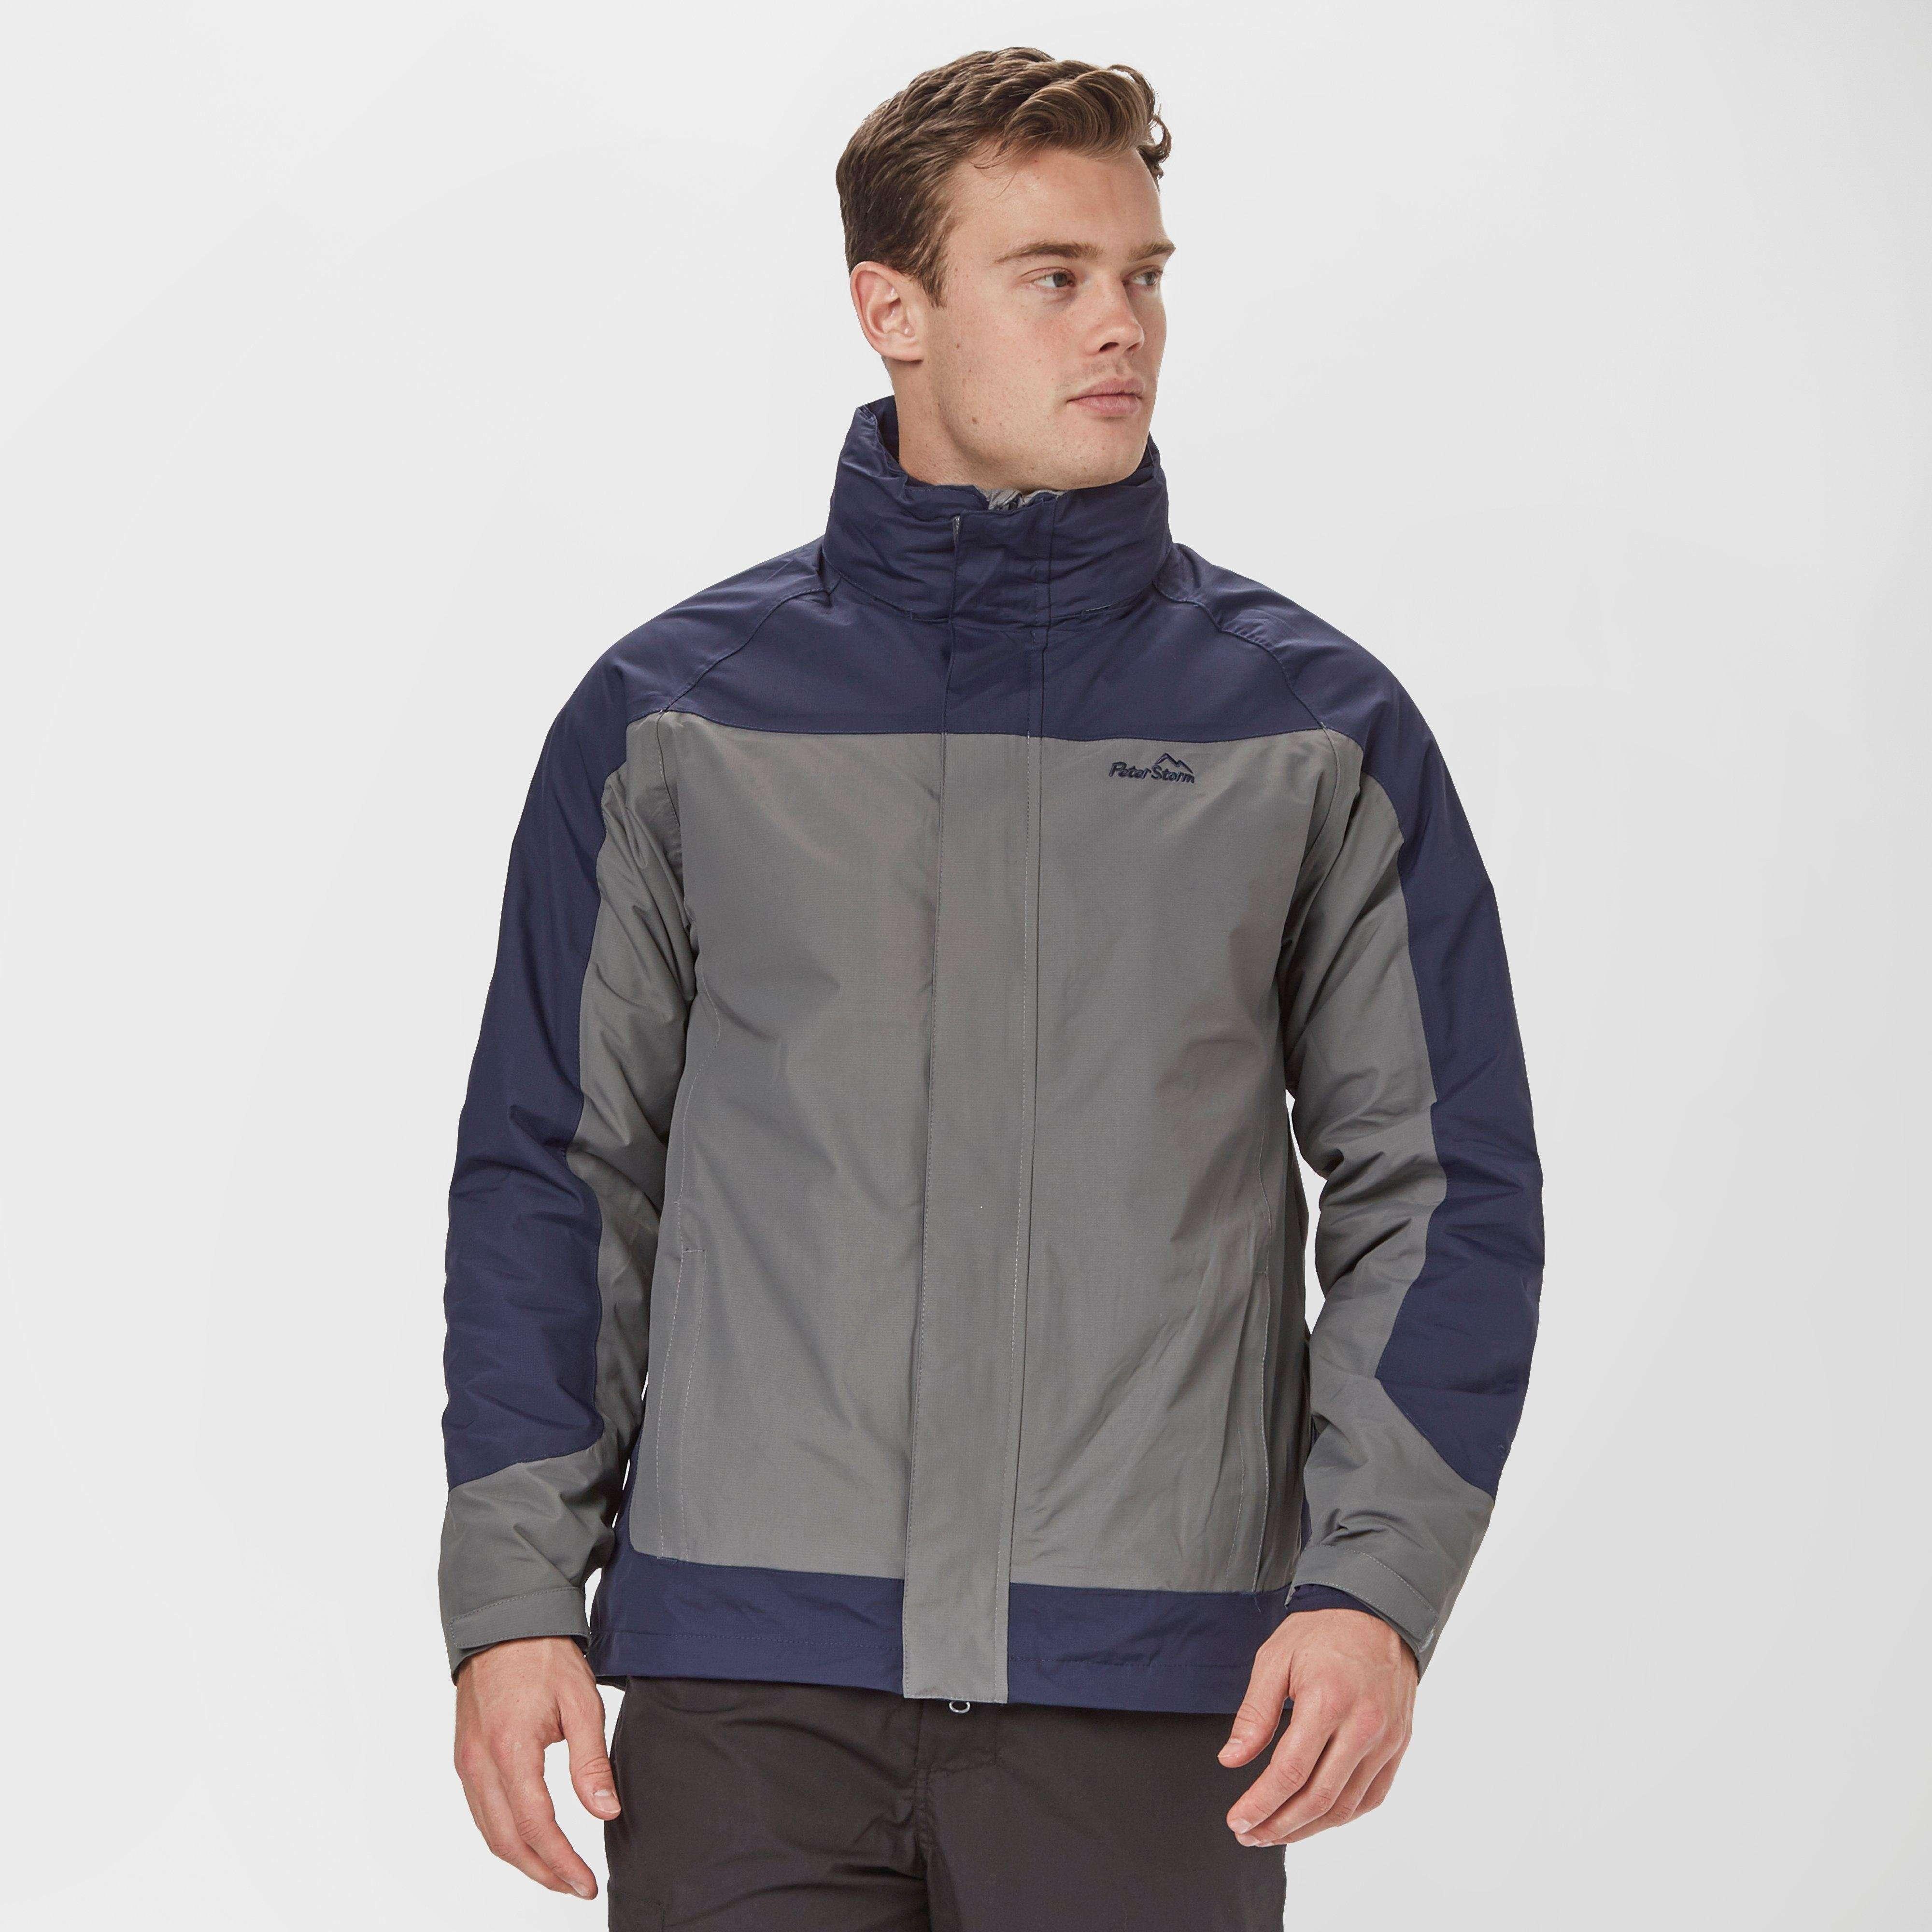 PETER STORM Men's Lakeside II 3 in 1 Jacket